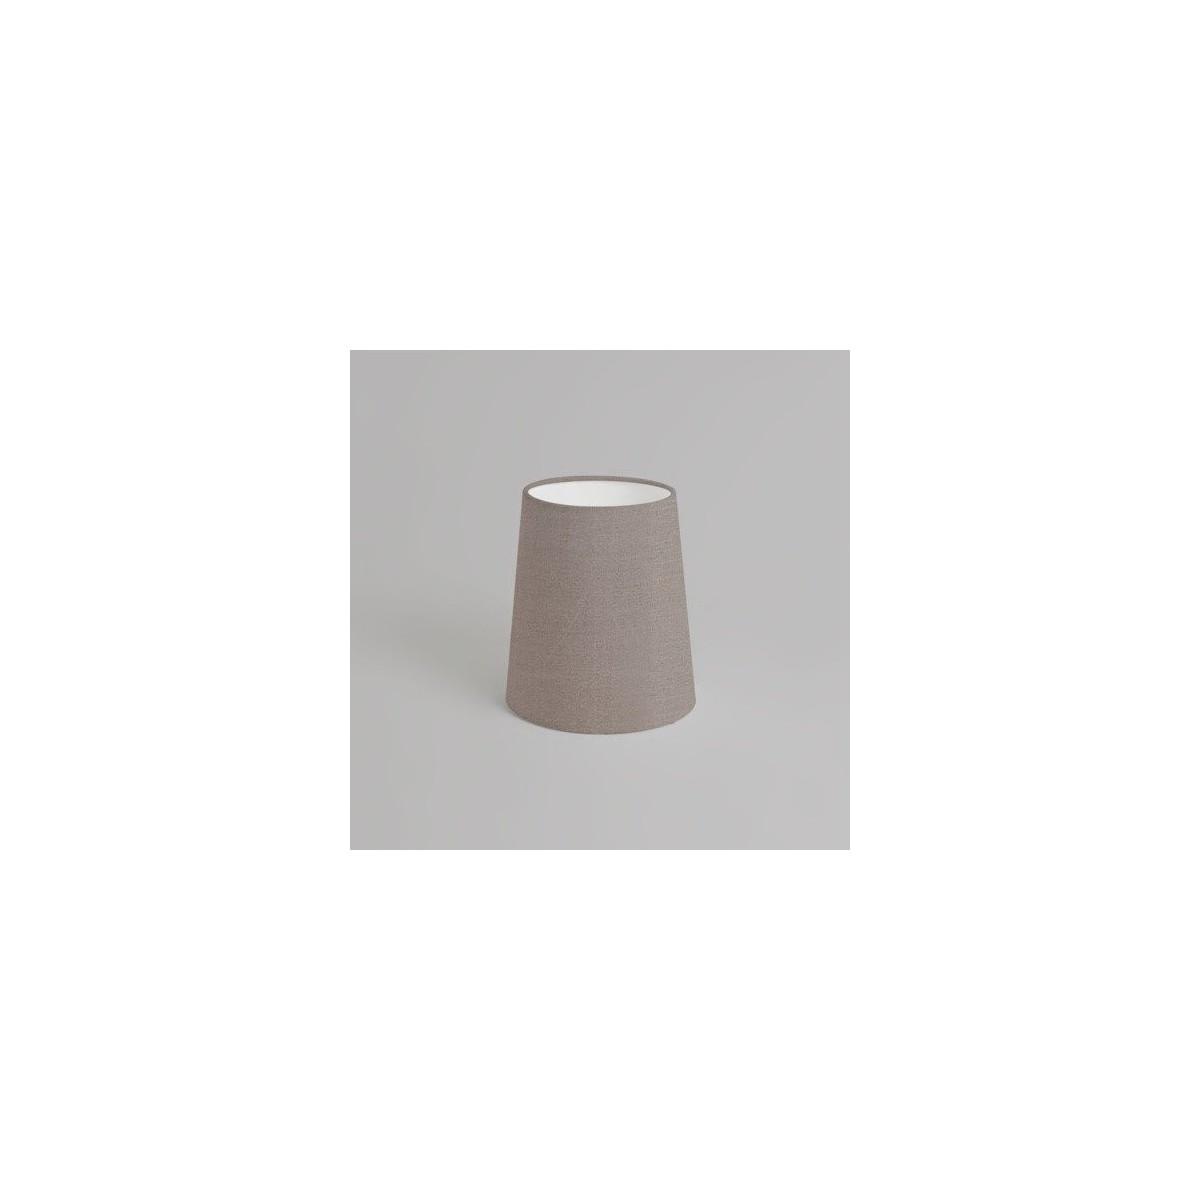 Astro Cone 145 Abażur Brudnobiały (Oyster) 5018010